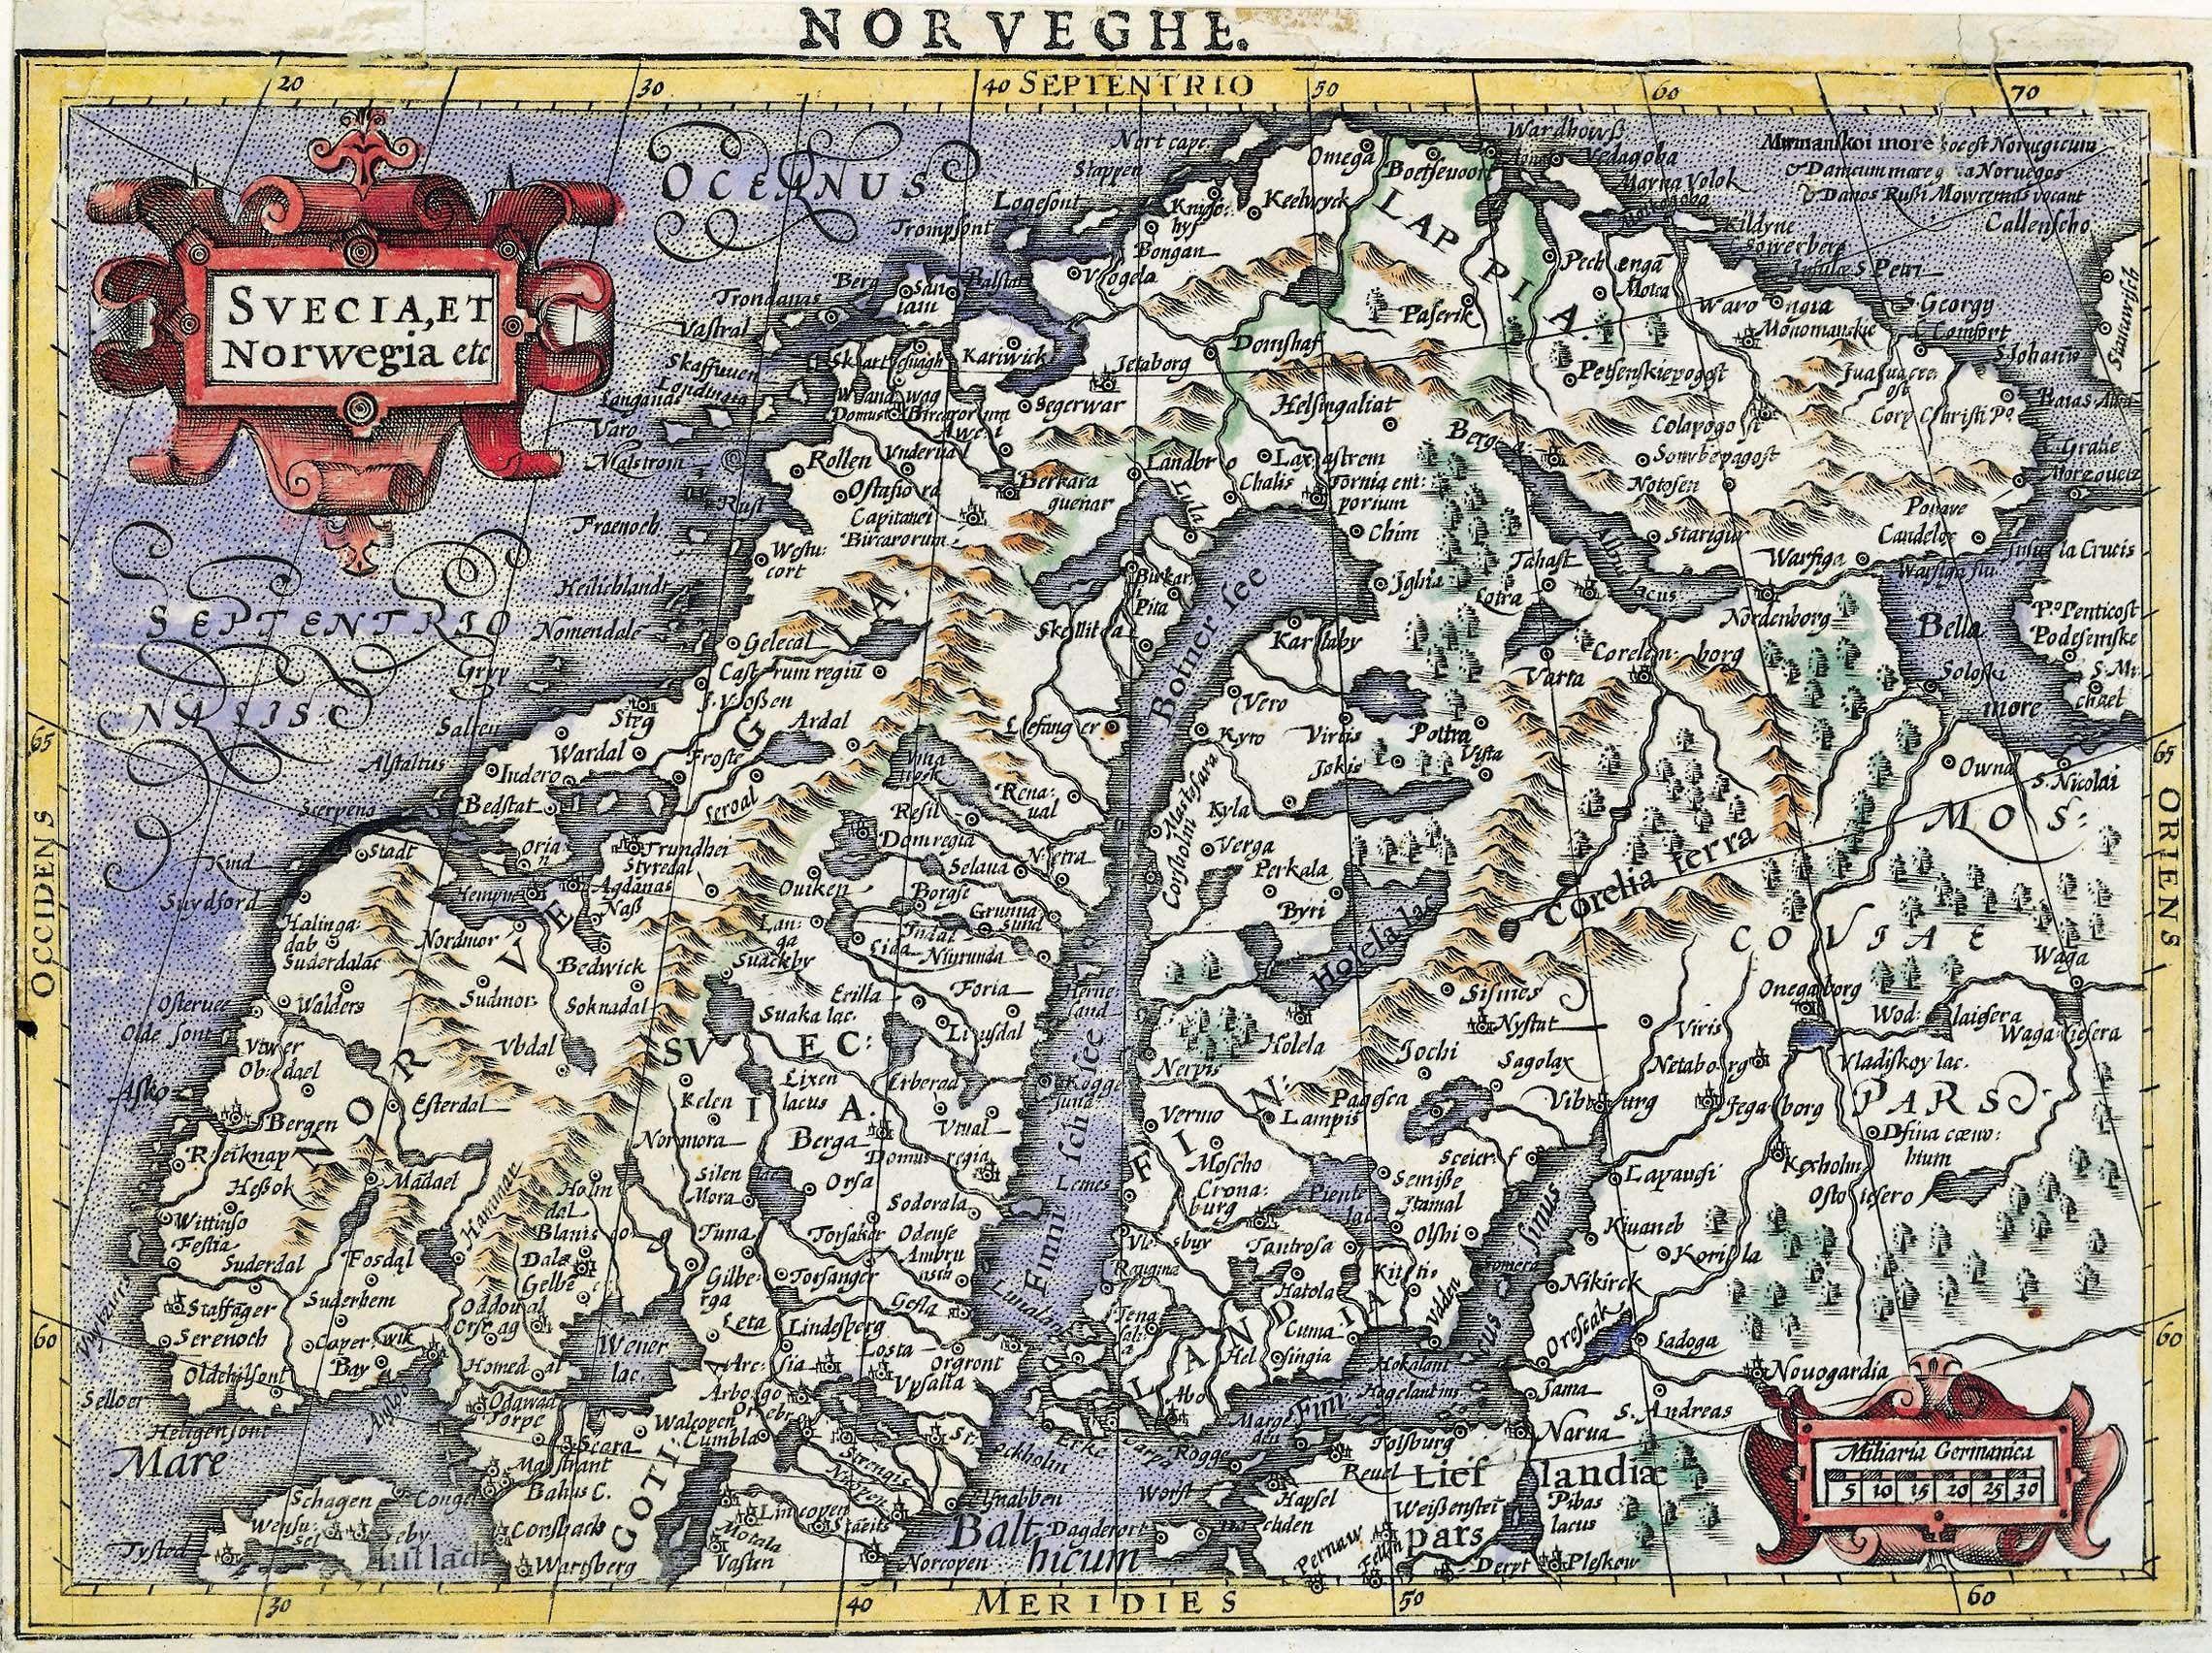 Scandinavia Map North Europe Map Norway Map Sweden Map Old Etsy In 2020 Sweden Map Norway Map Old Map